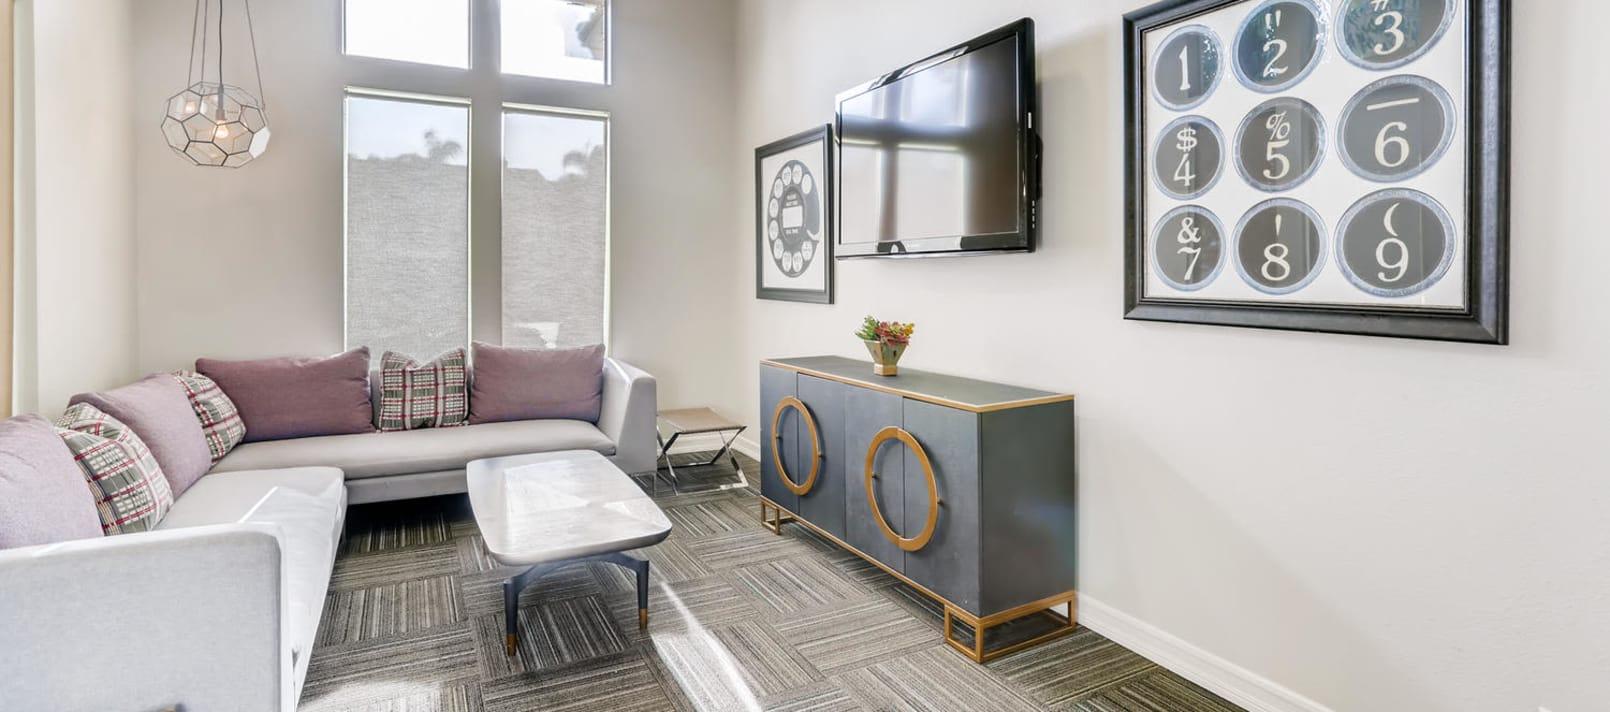 Screening Gaming Room at Alize at Aliso Viejo Apartment Homes in Aliso Viejo, California